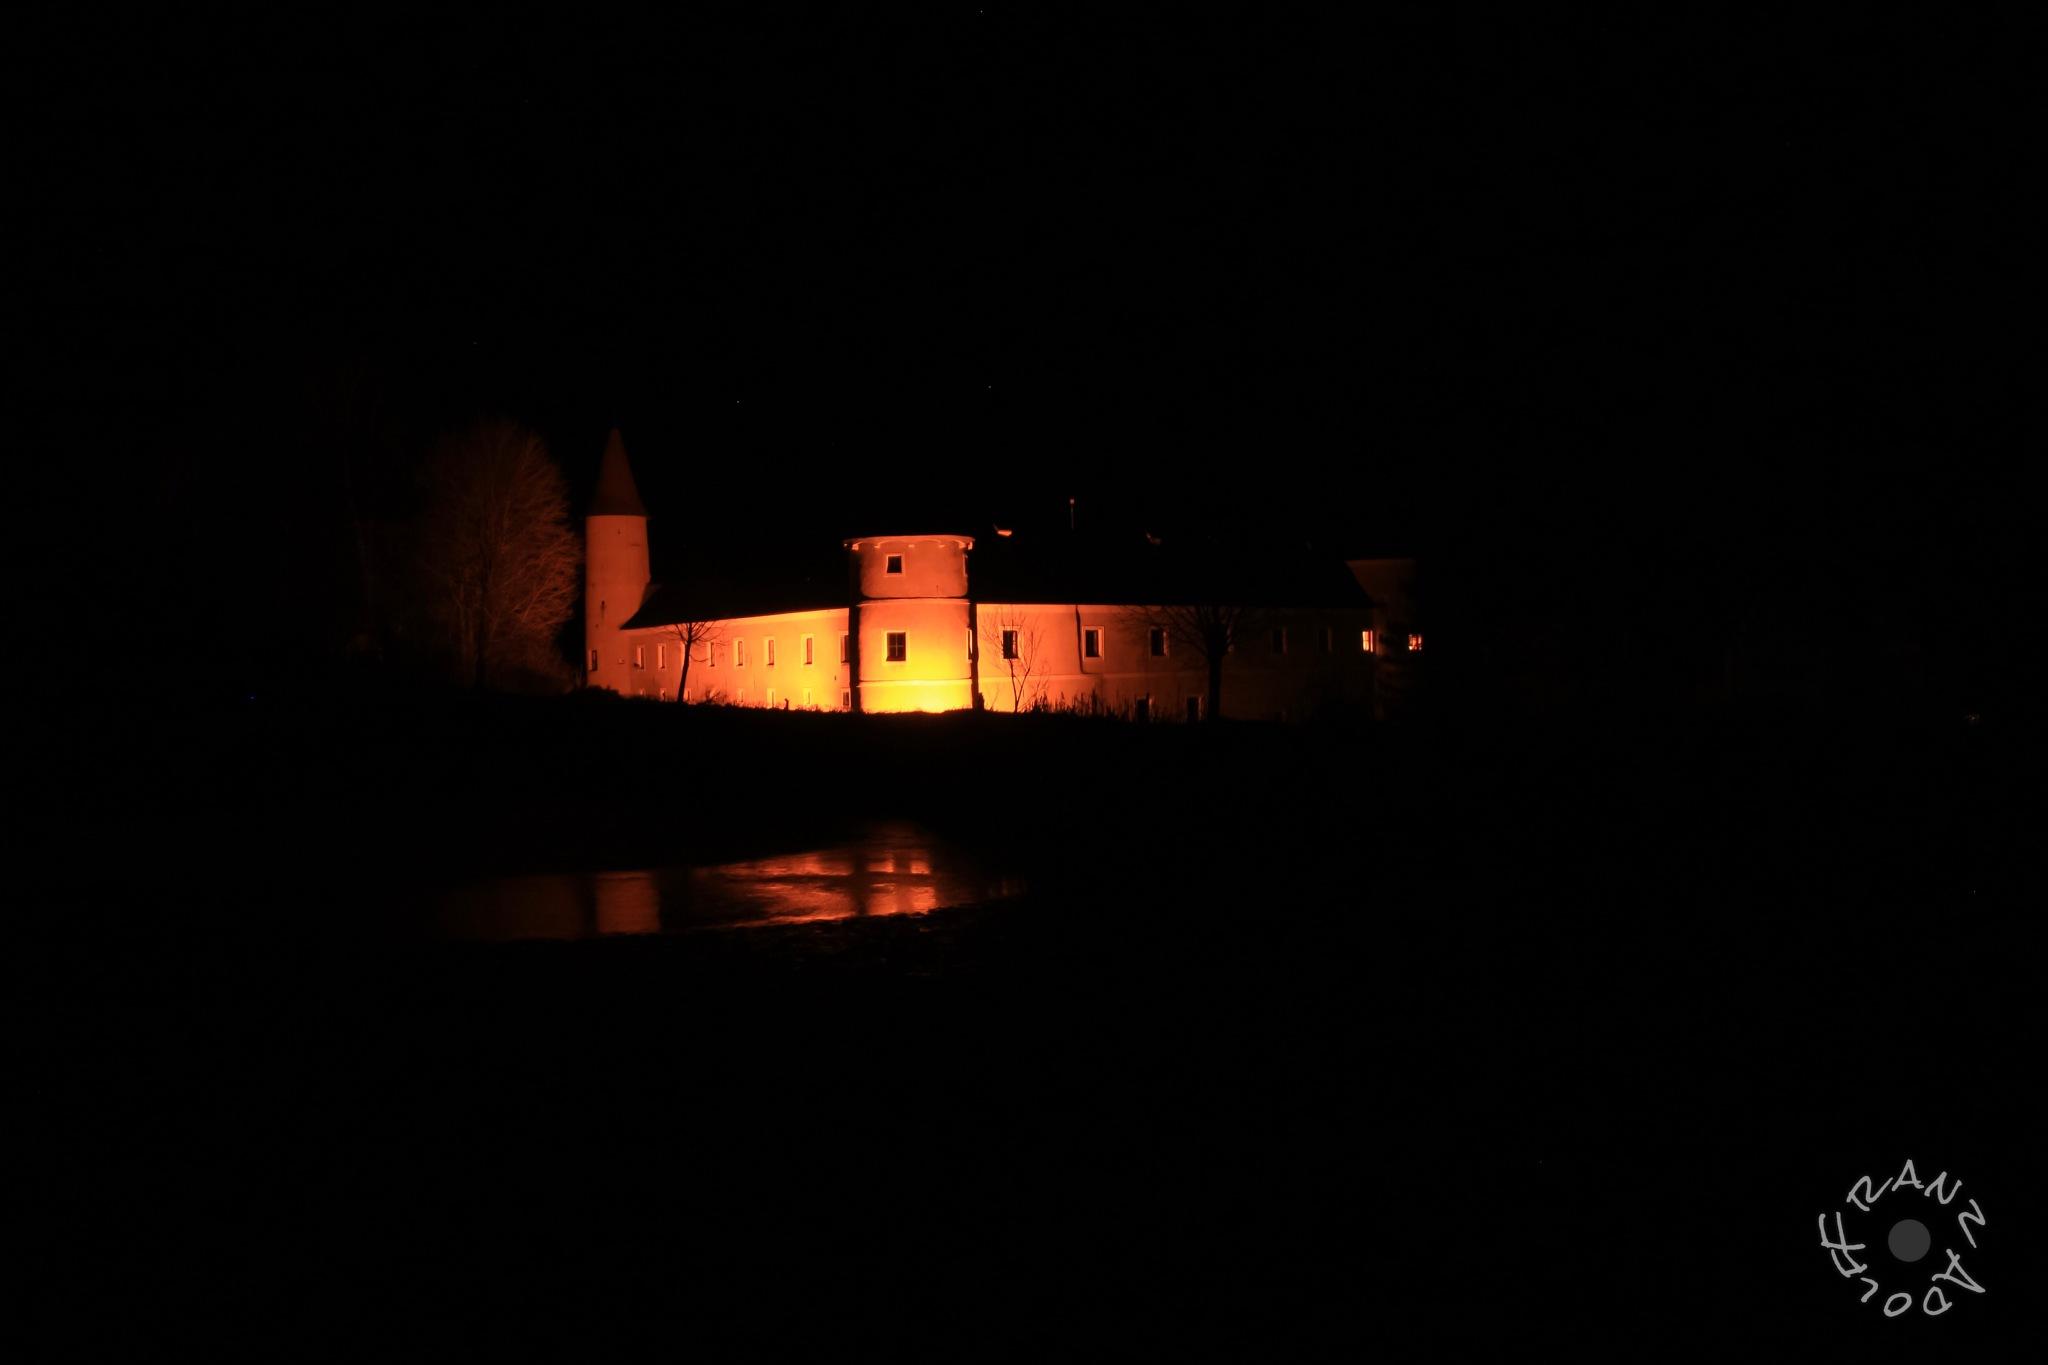 Castle of Waldreichs  1 by Franzl